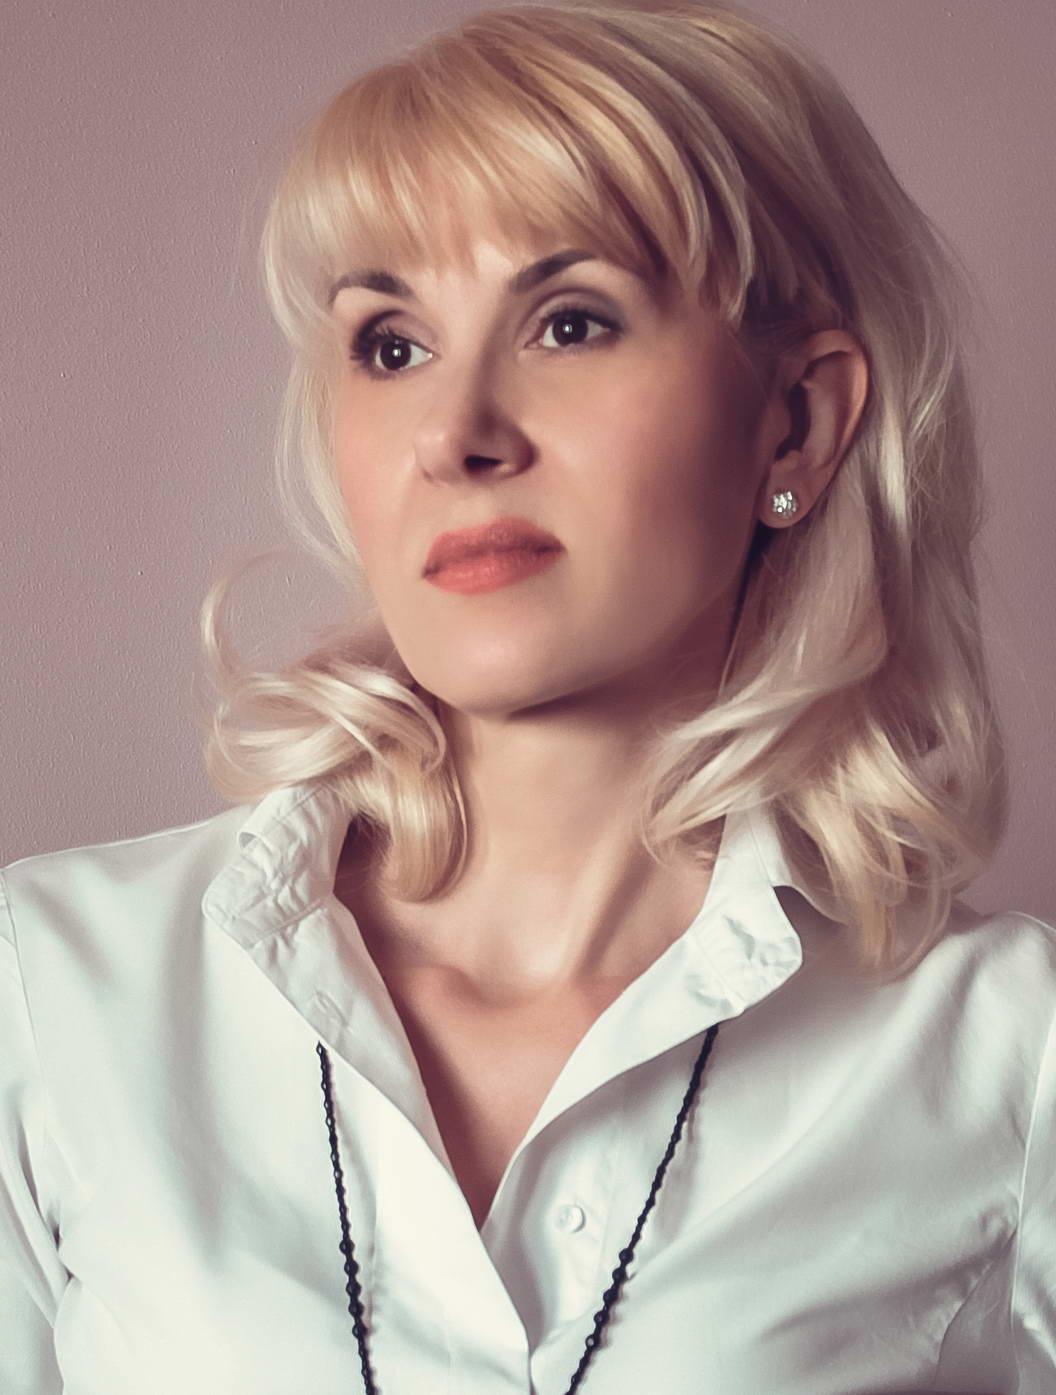 Partnersuche Ukraine, Russland, Osteuropa. Single Frauen